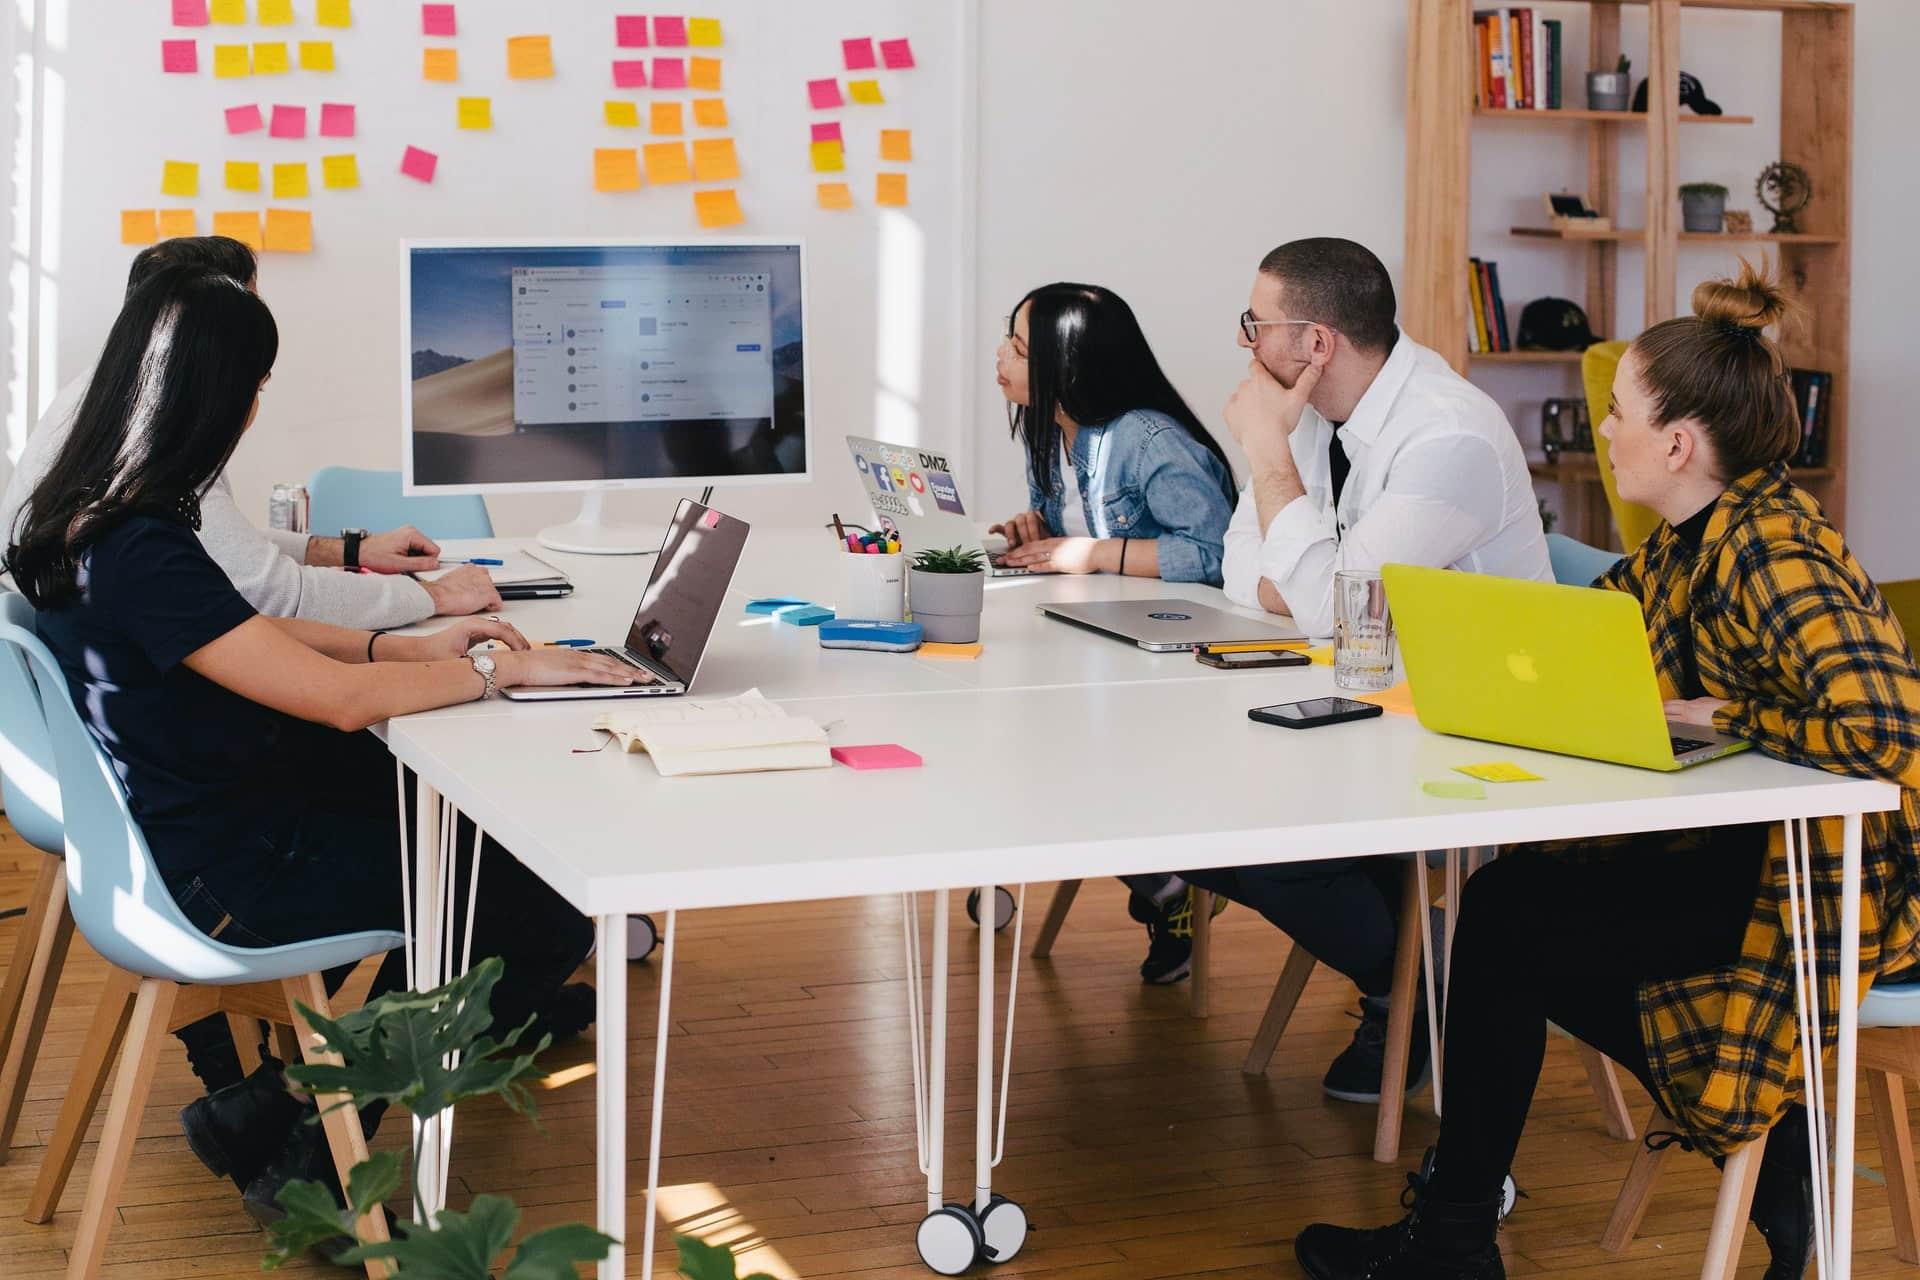 Innovation Culture Company Header Image